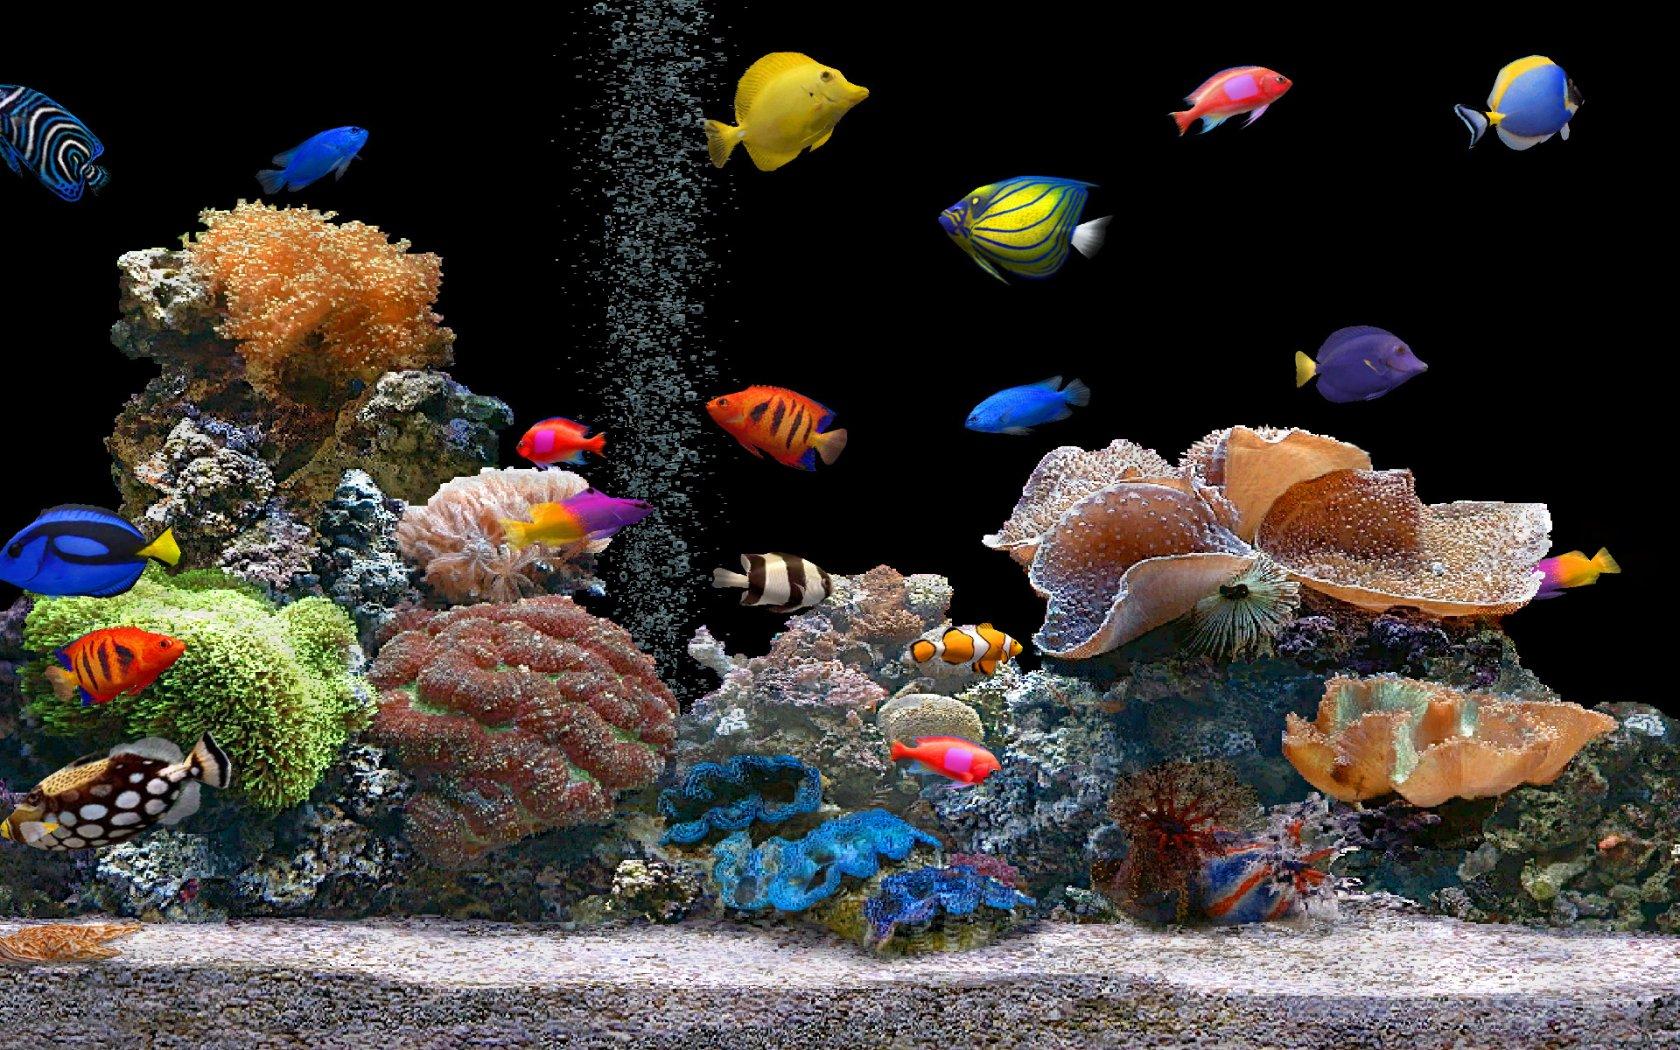 44 Awesome Hd Fish Tank Wallpapers On Wallpapersafari